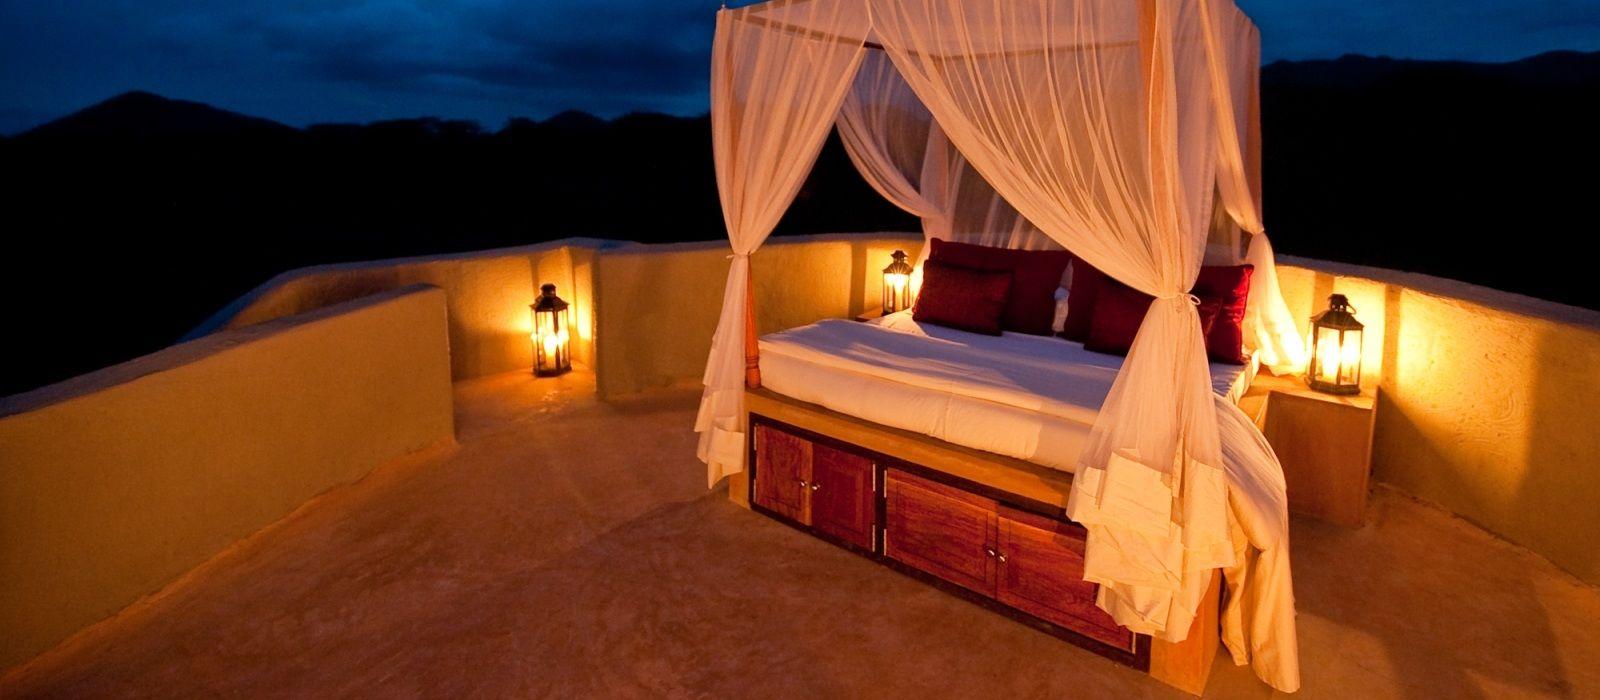 Hotel Ol Donyo Lodge Kenia